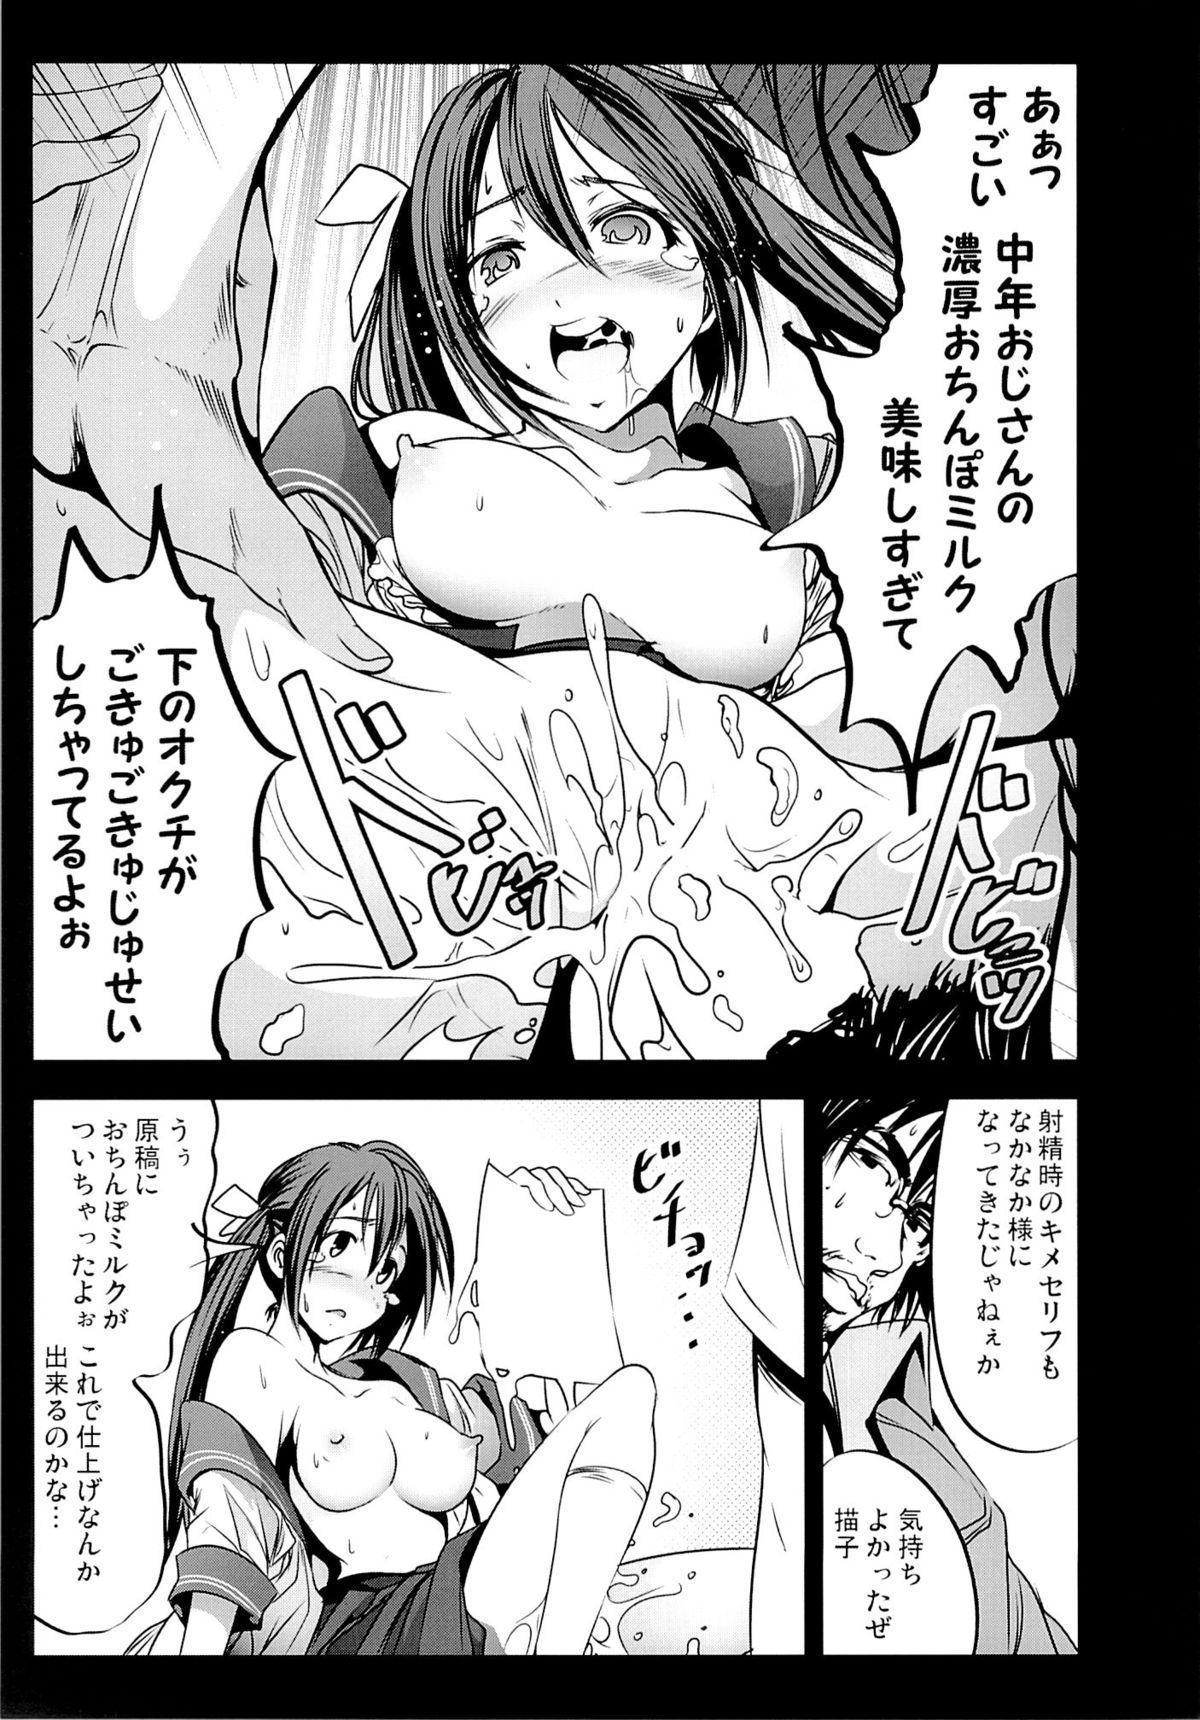 H na Doujinshi no Kakikata 21